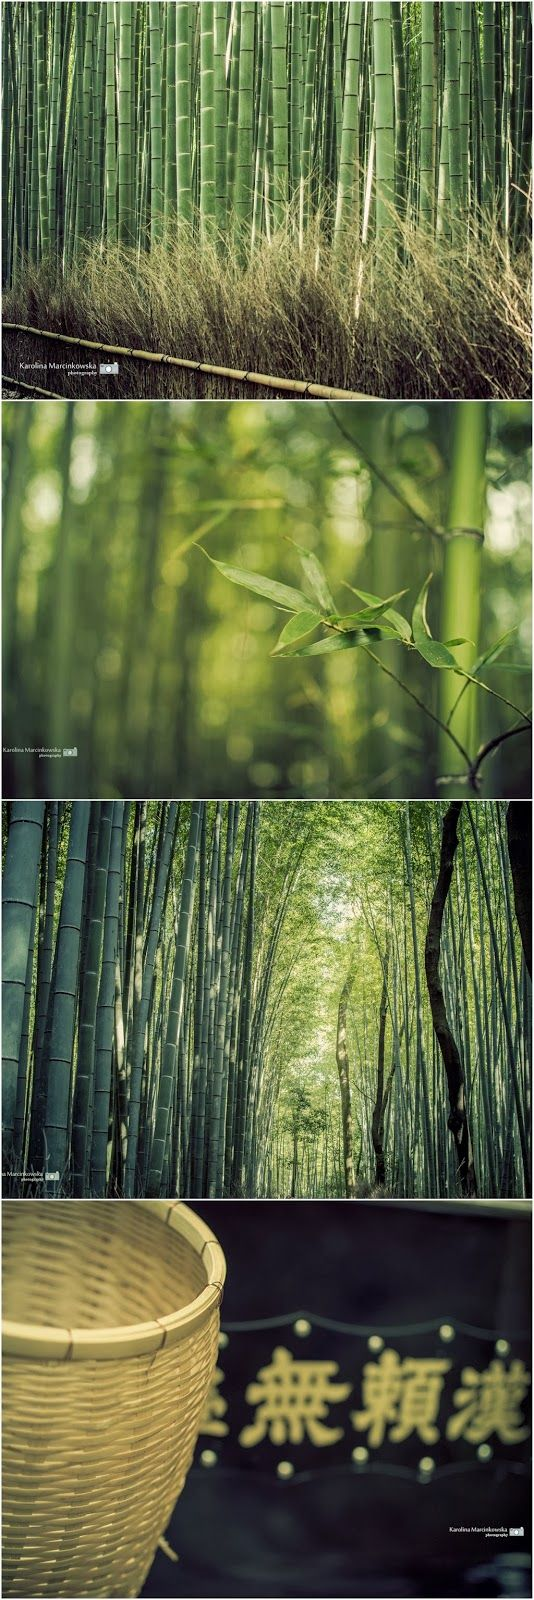 Bamboo forest - Arashiyama, Japan, Kyoto